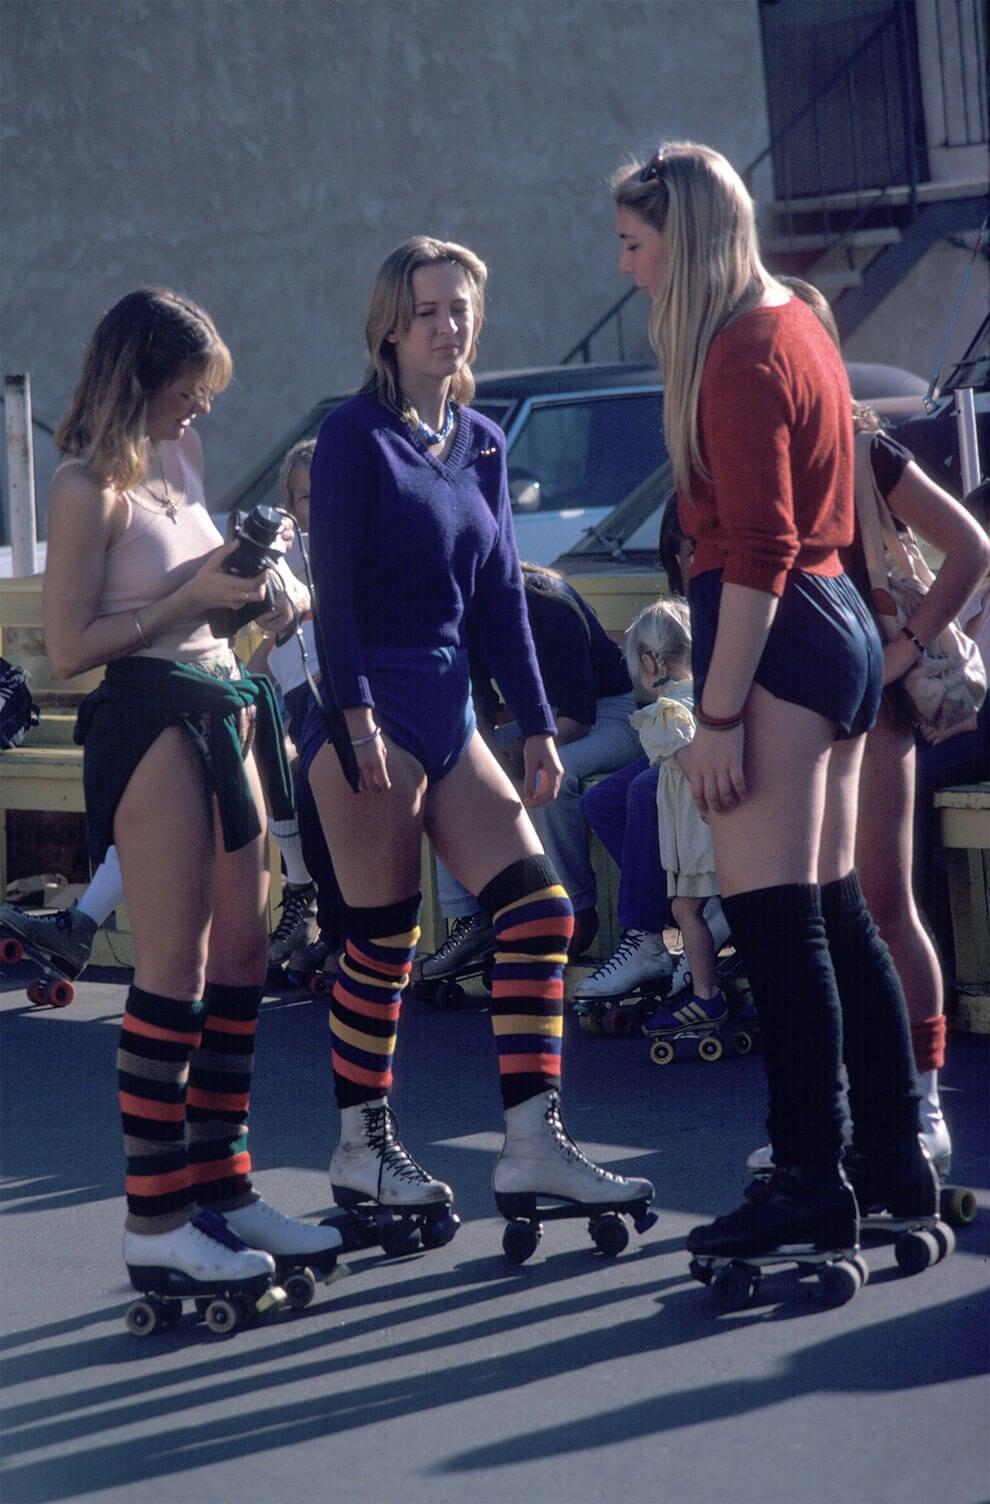 venice-beach-roller-skaters-4